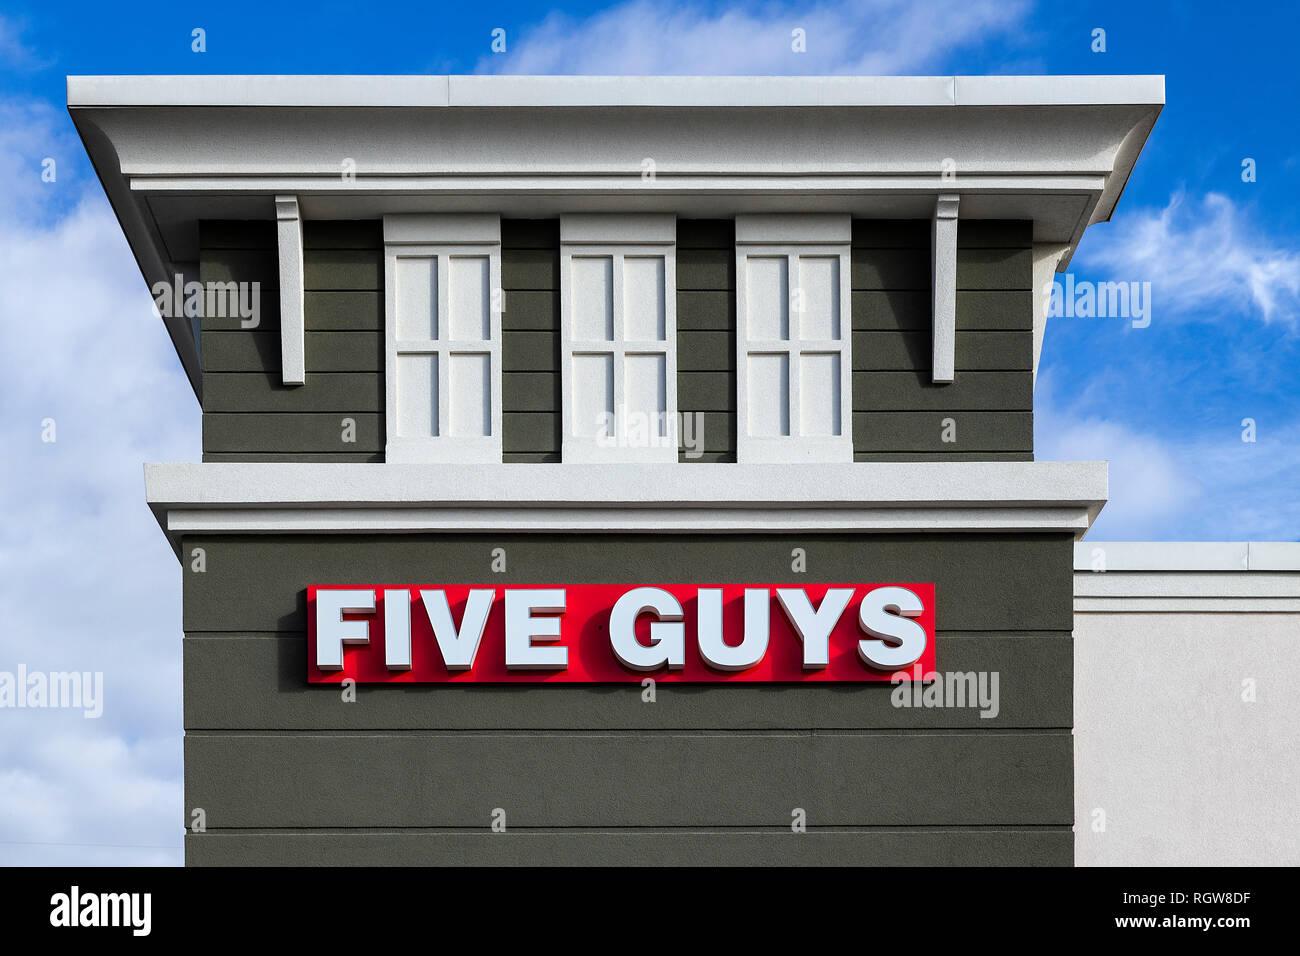 Cinq gars restaurant extérieur, Orlando, Floride, USA. Photo Stock